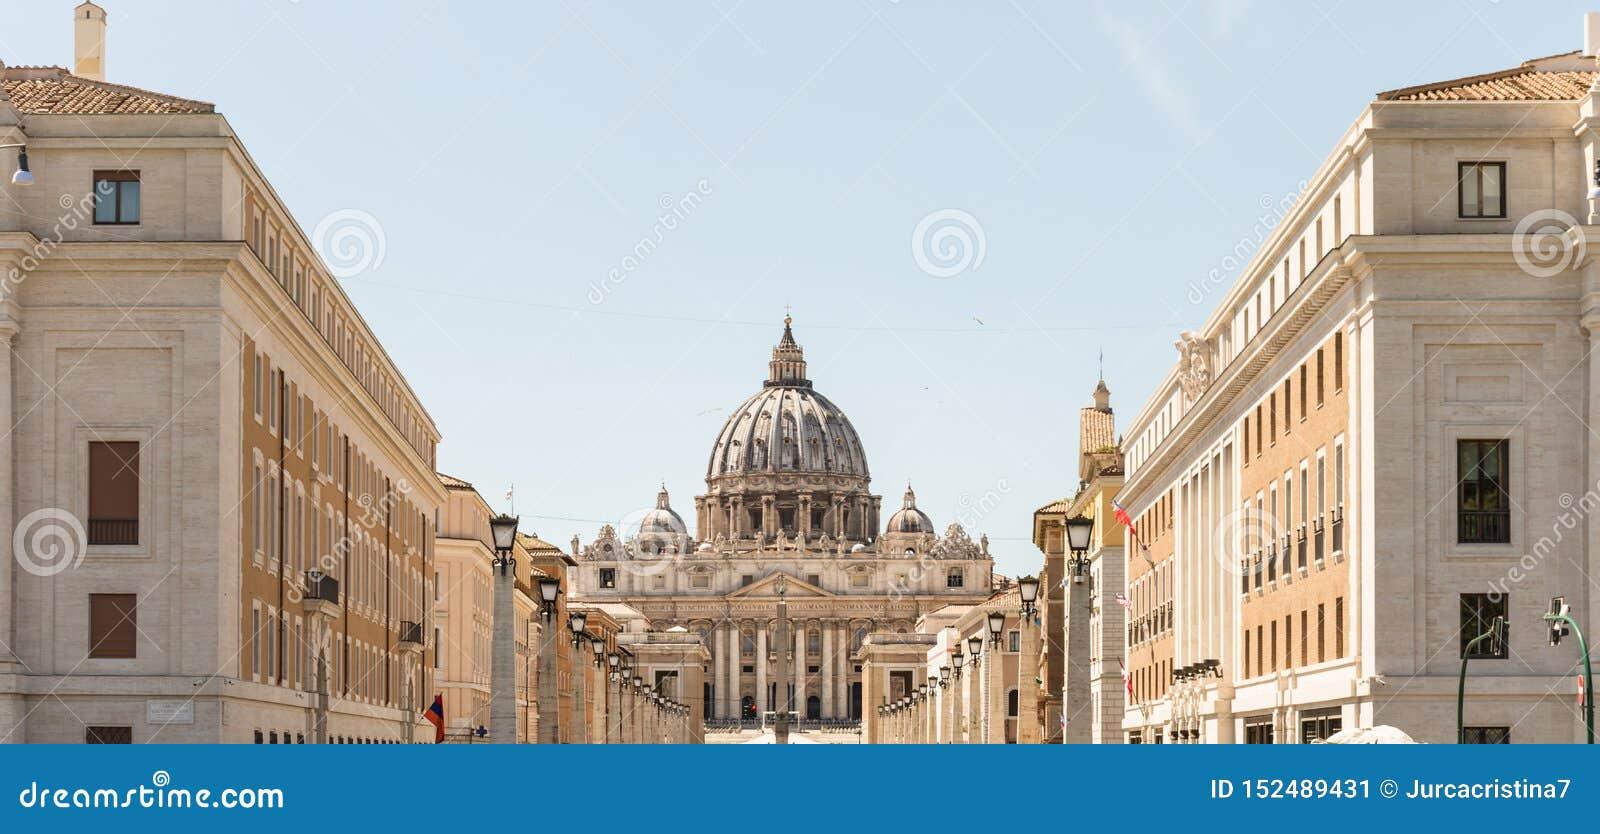 Sts Peter basilika, huvudsakliga fasad och kupol peter rome s f?r springbrunn f?r stad f?r bakgrundsbasilicabernini fyrkantig st